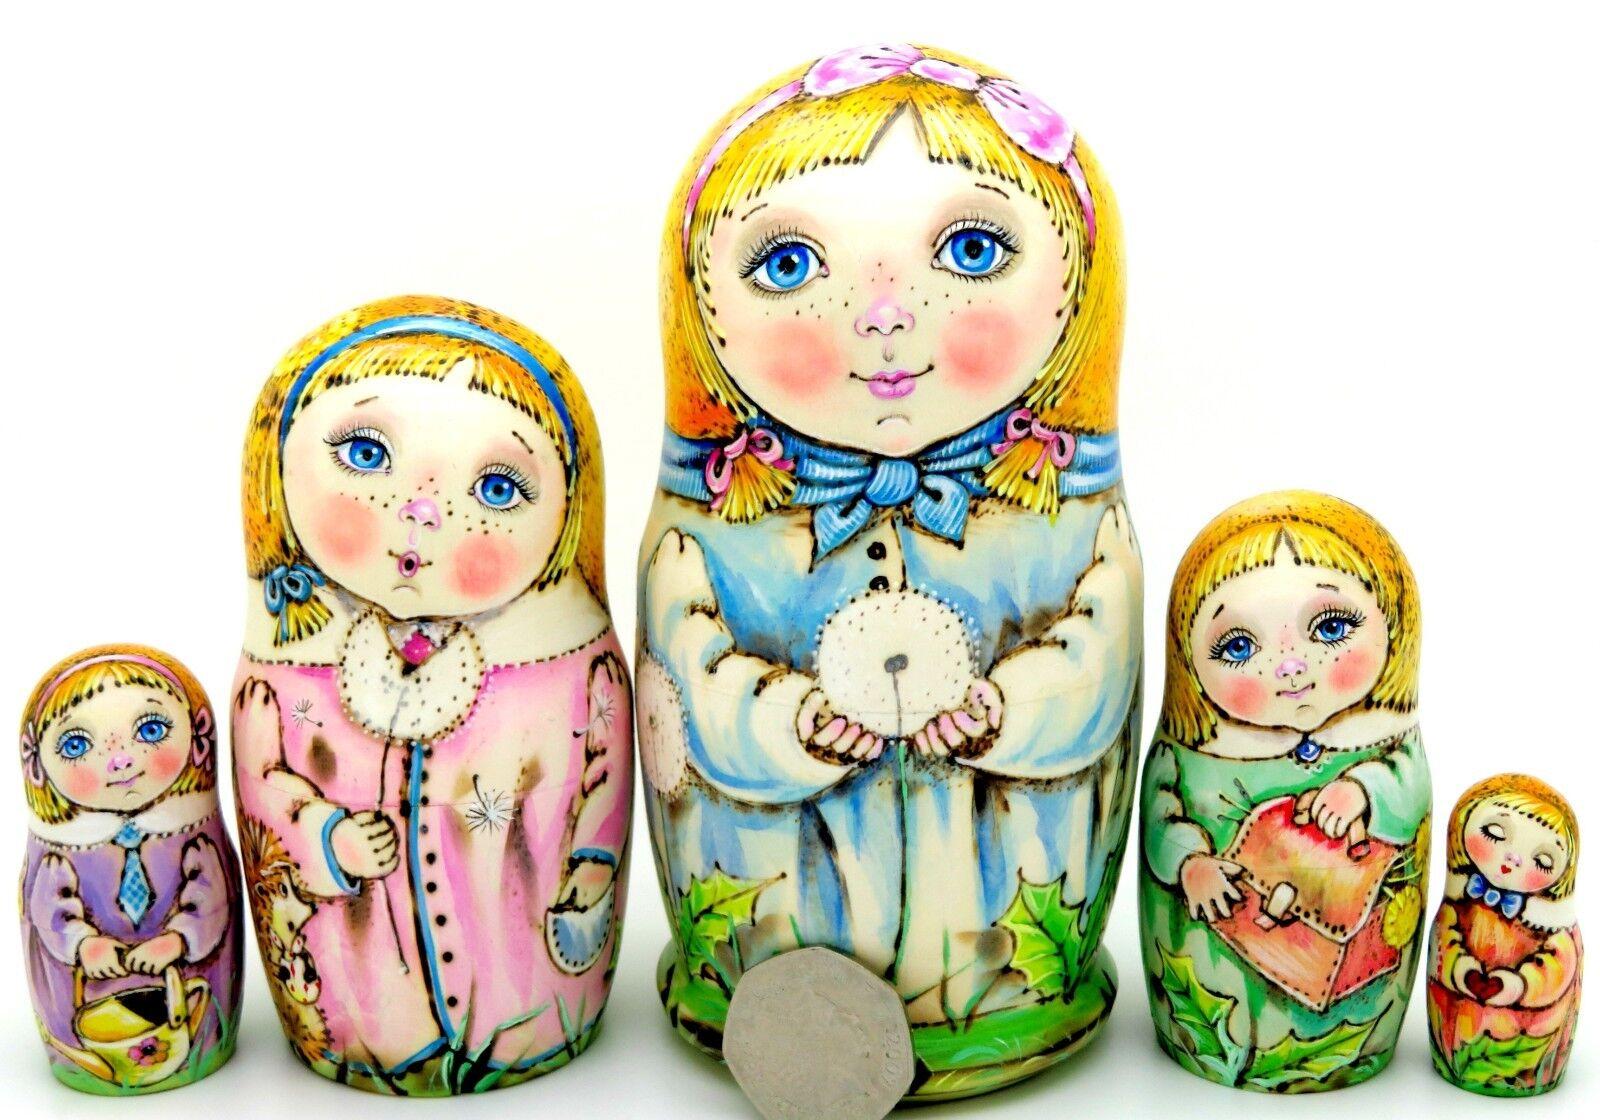 Matriosca Russa Bambole Matrioska Baautobushka  5 Pirografia Bambine Chmeleva  più ordine